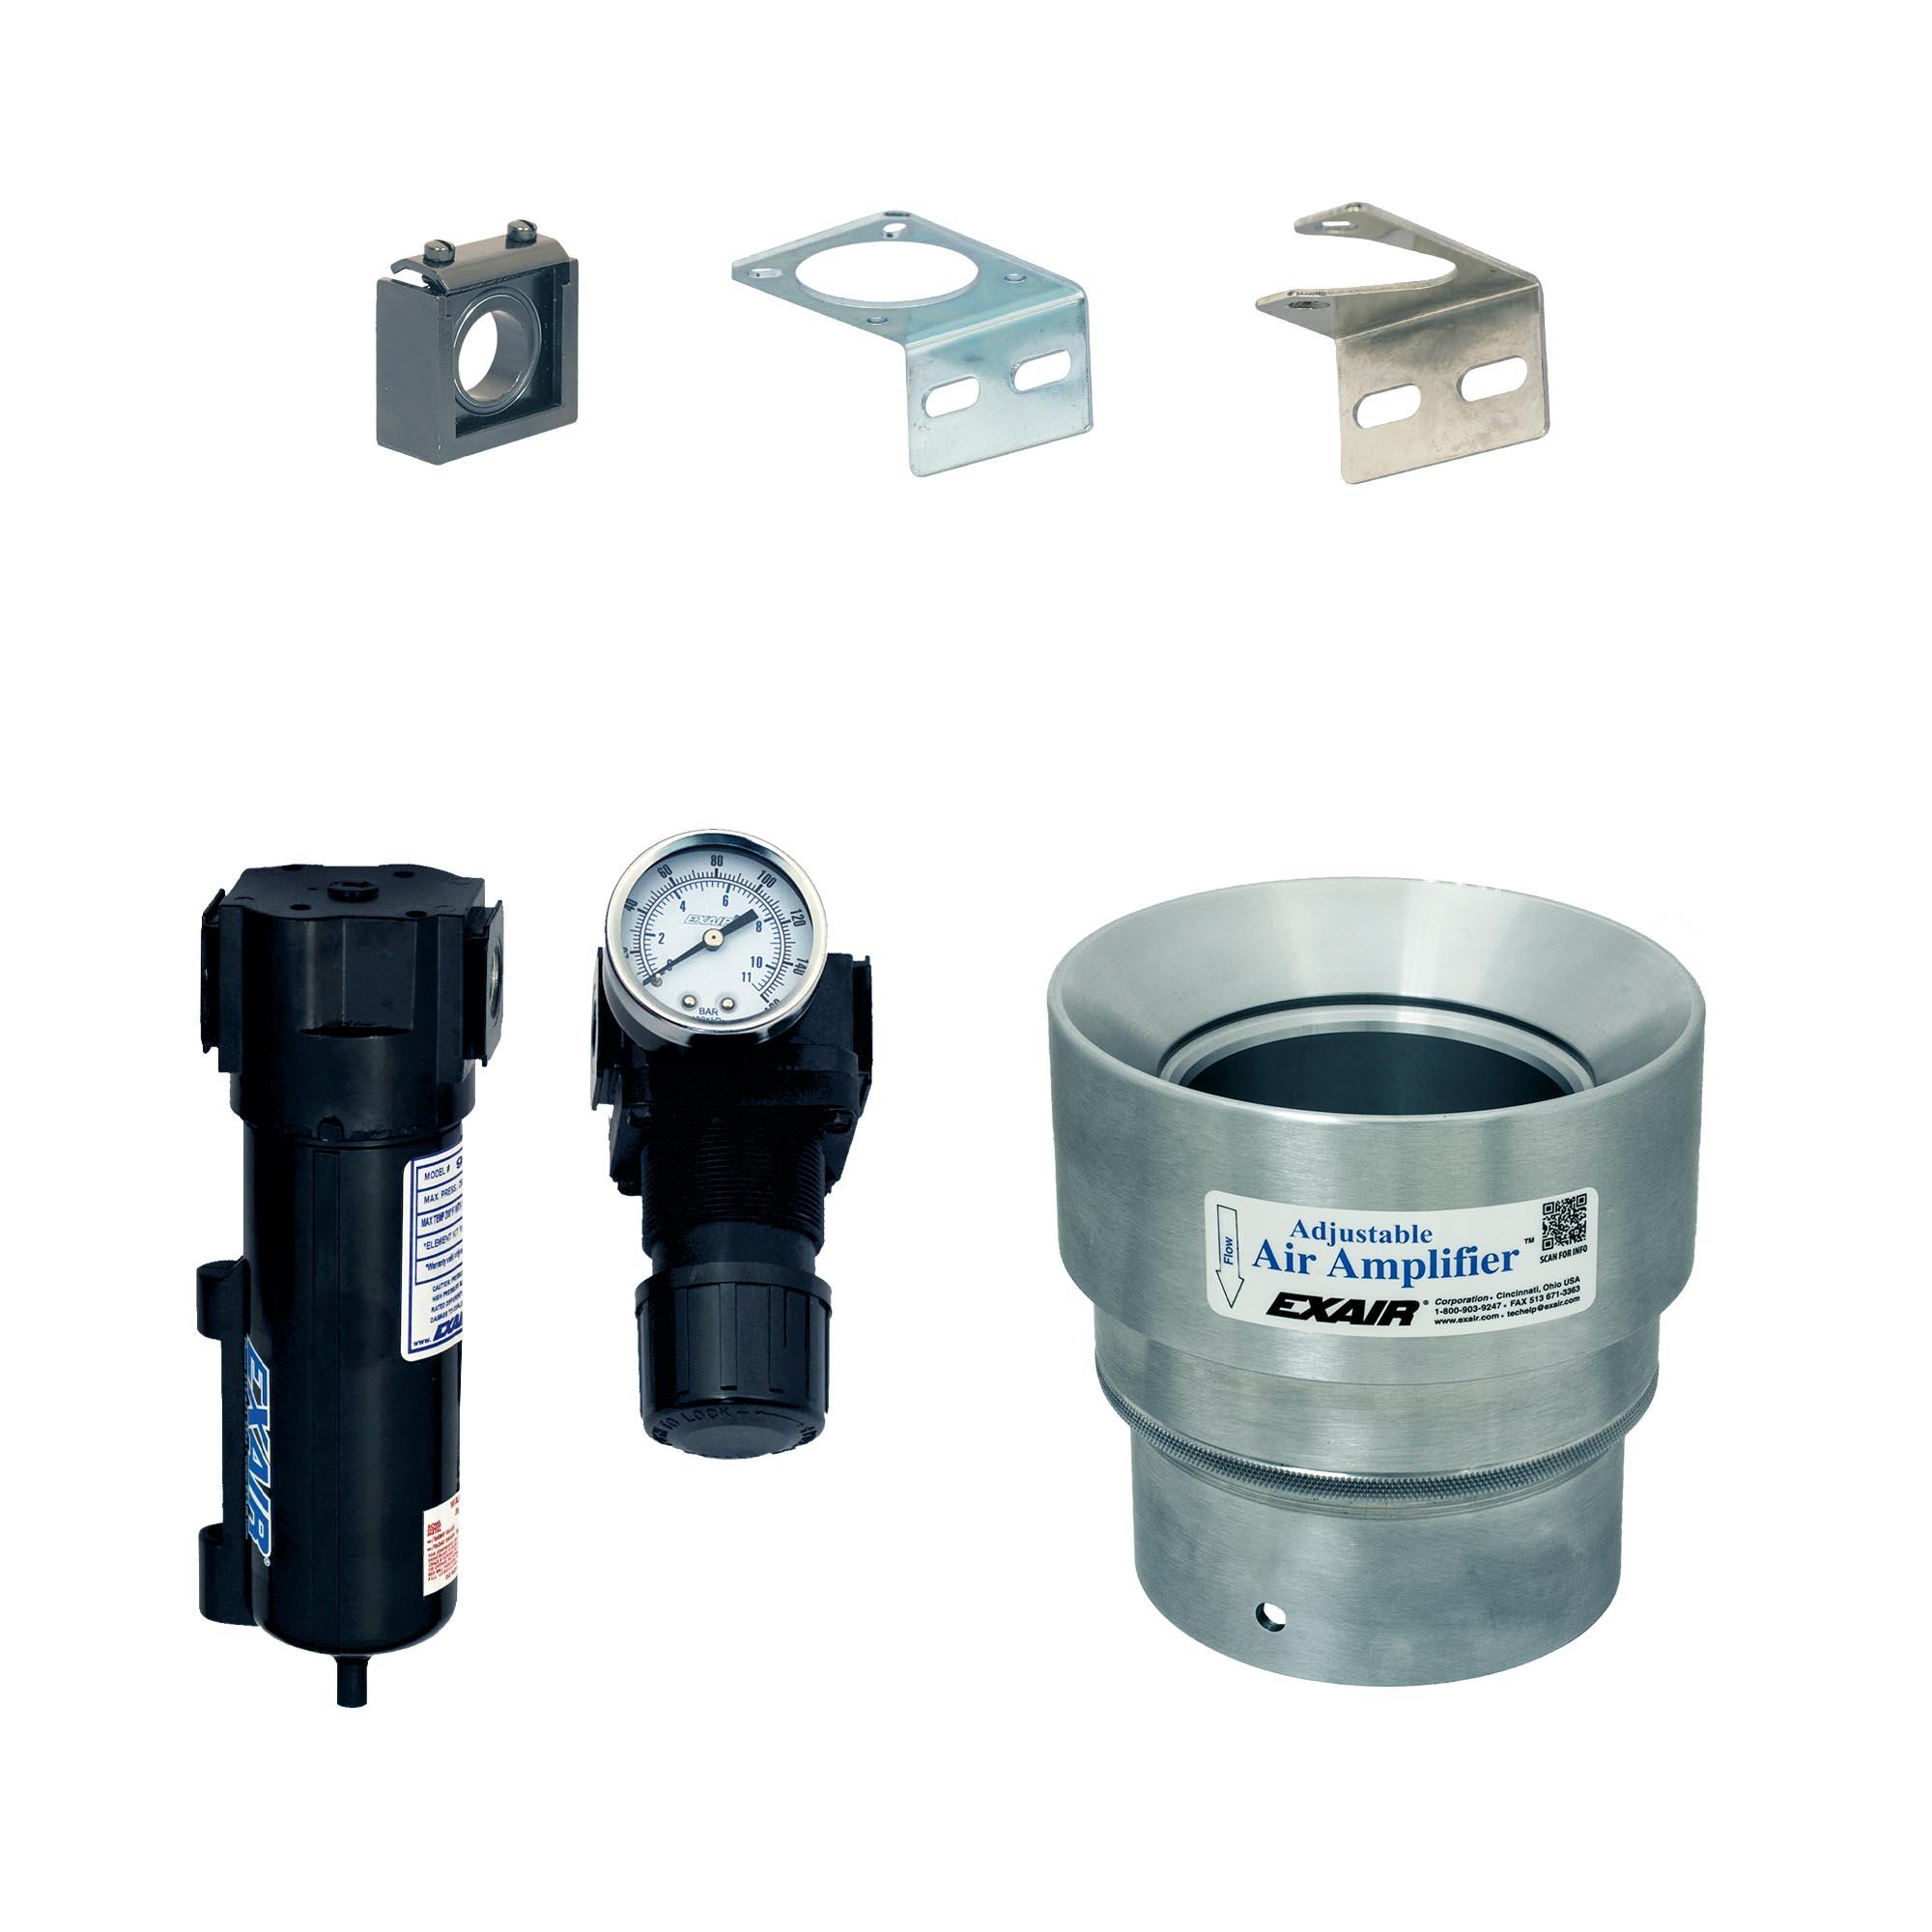 Aluminum Adjustable Air Amplifier Kit